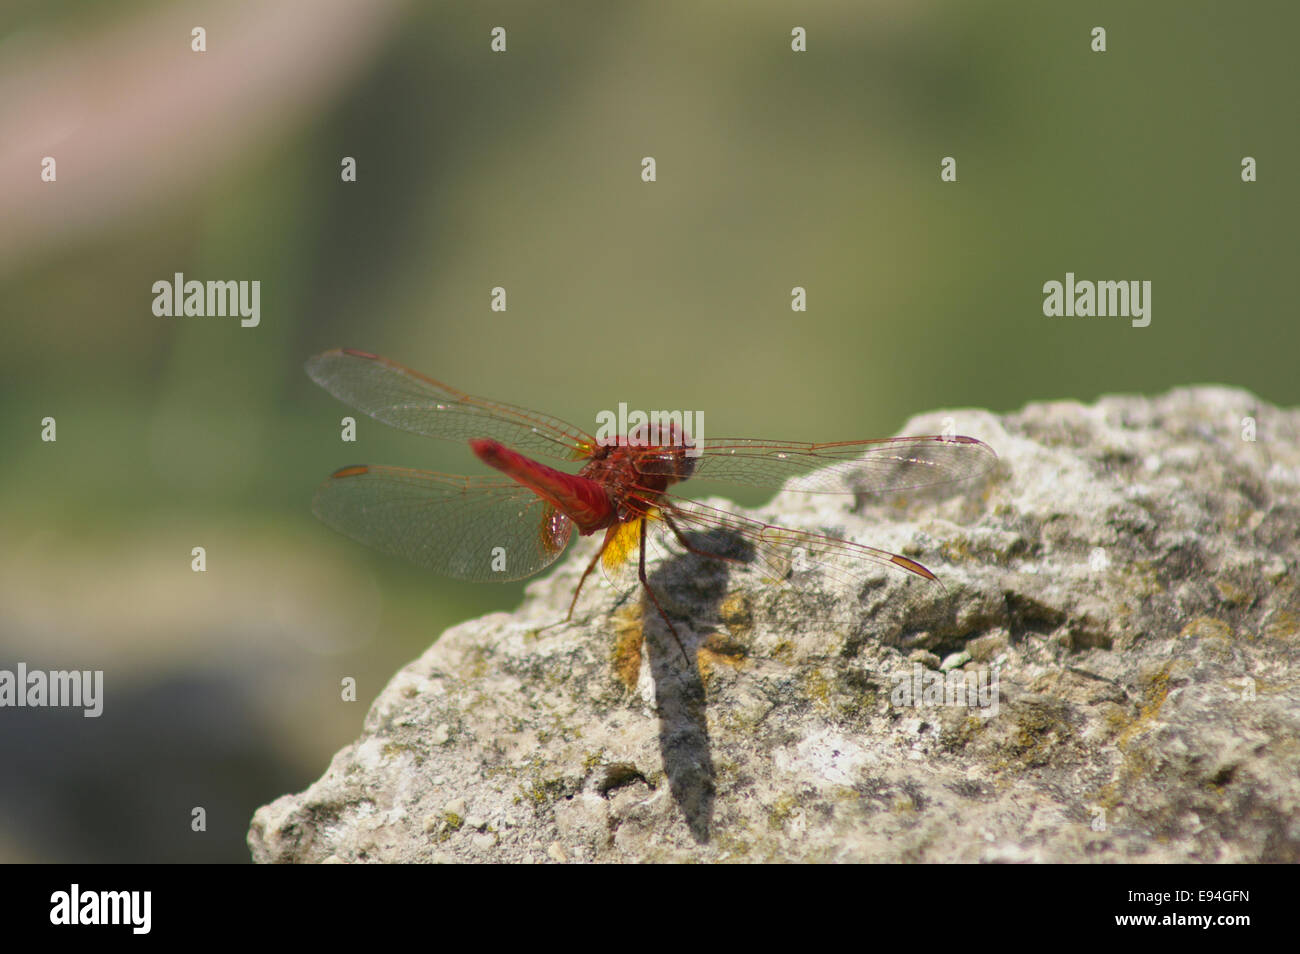 Crocothemis erythraea - Scarlet Dragonfly Stock Photo